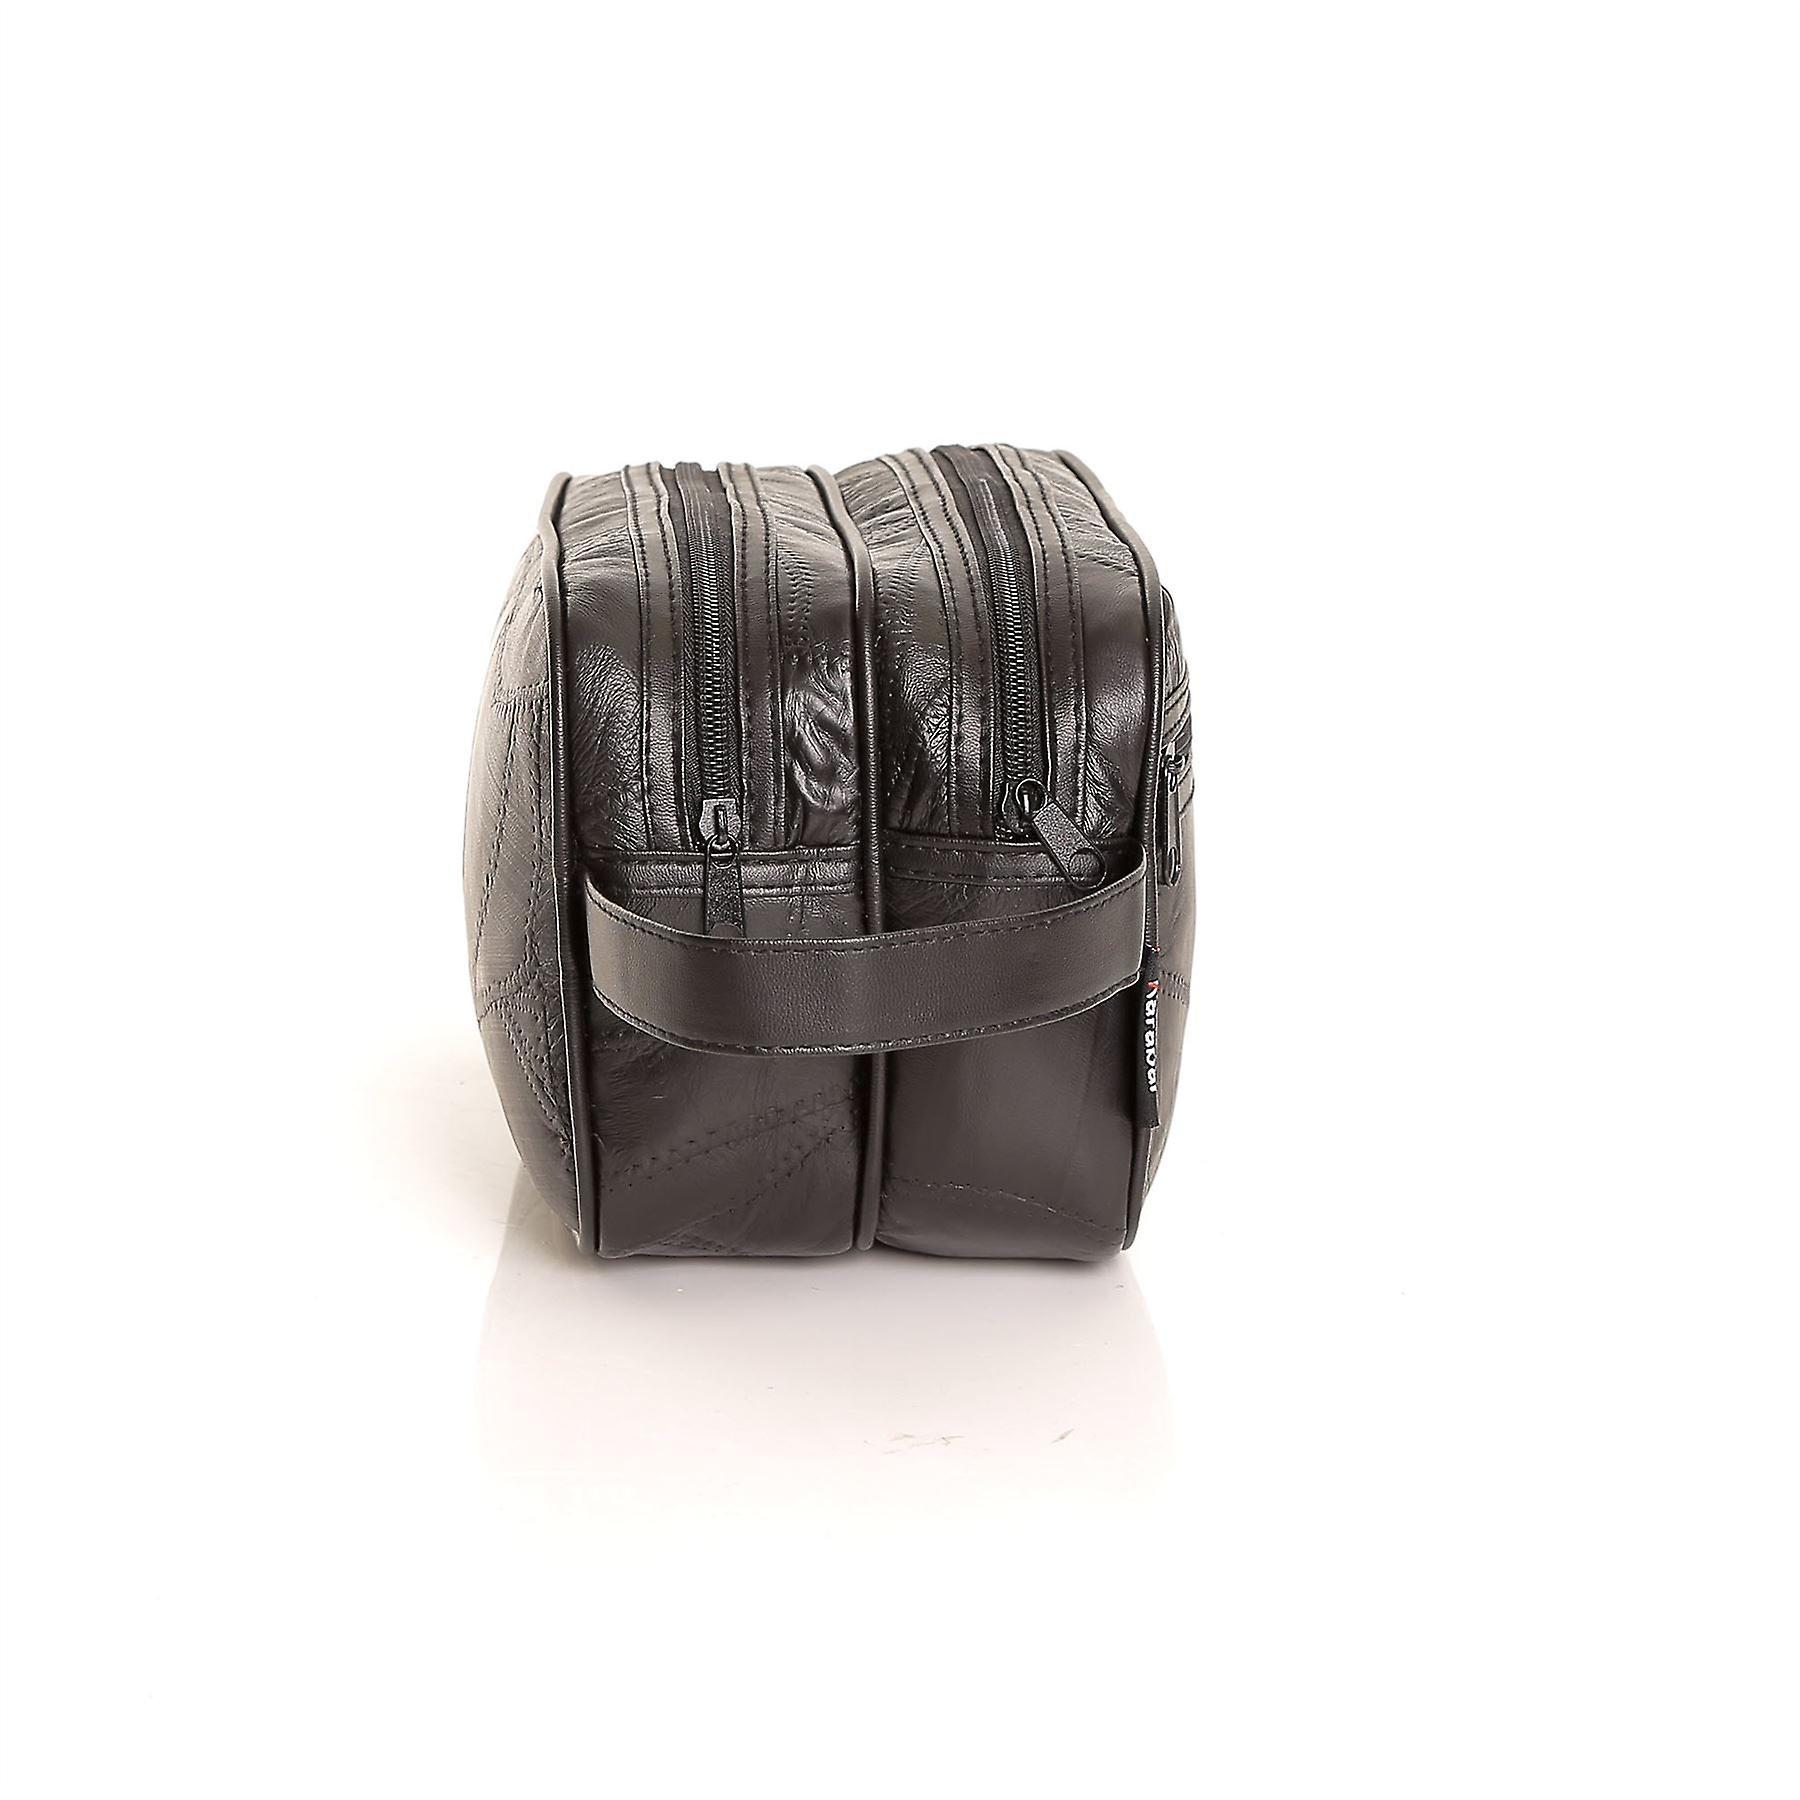 Karabar Russell Mens Leather Travel Wash Bag, Black